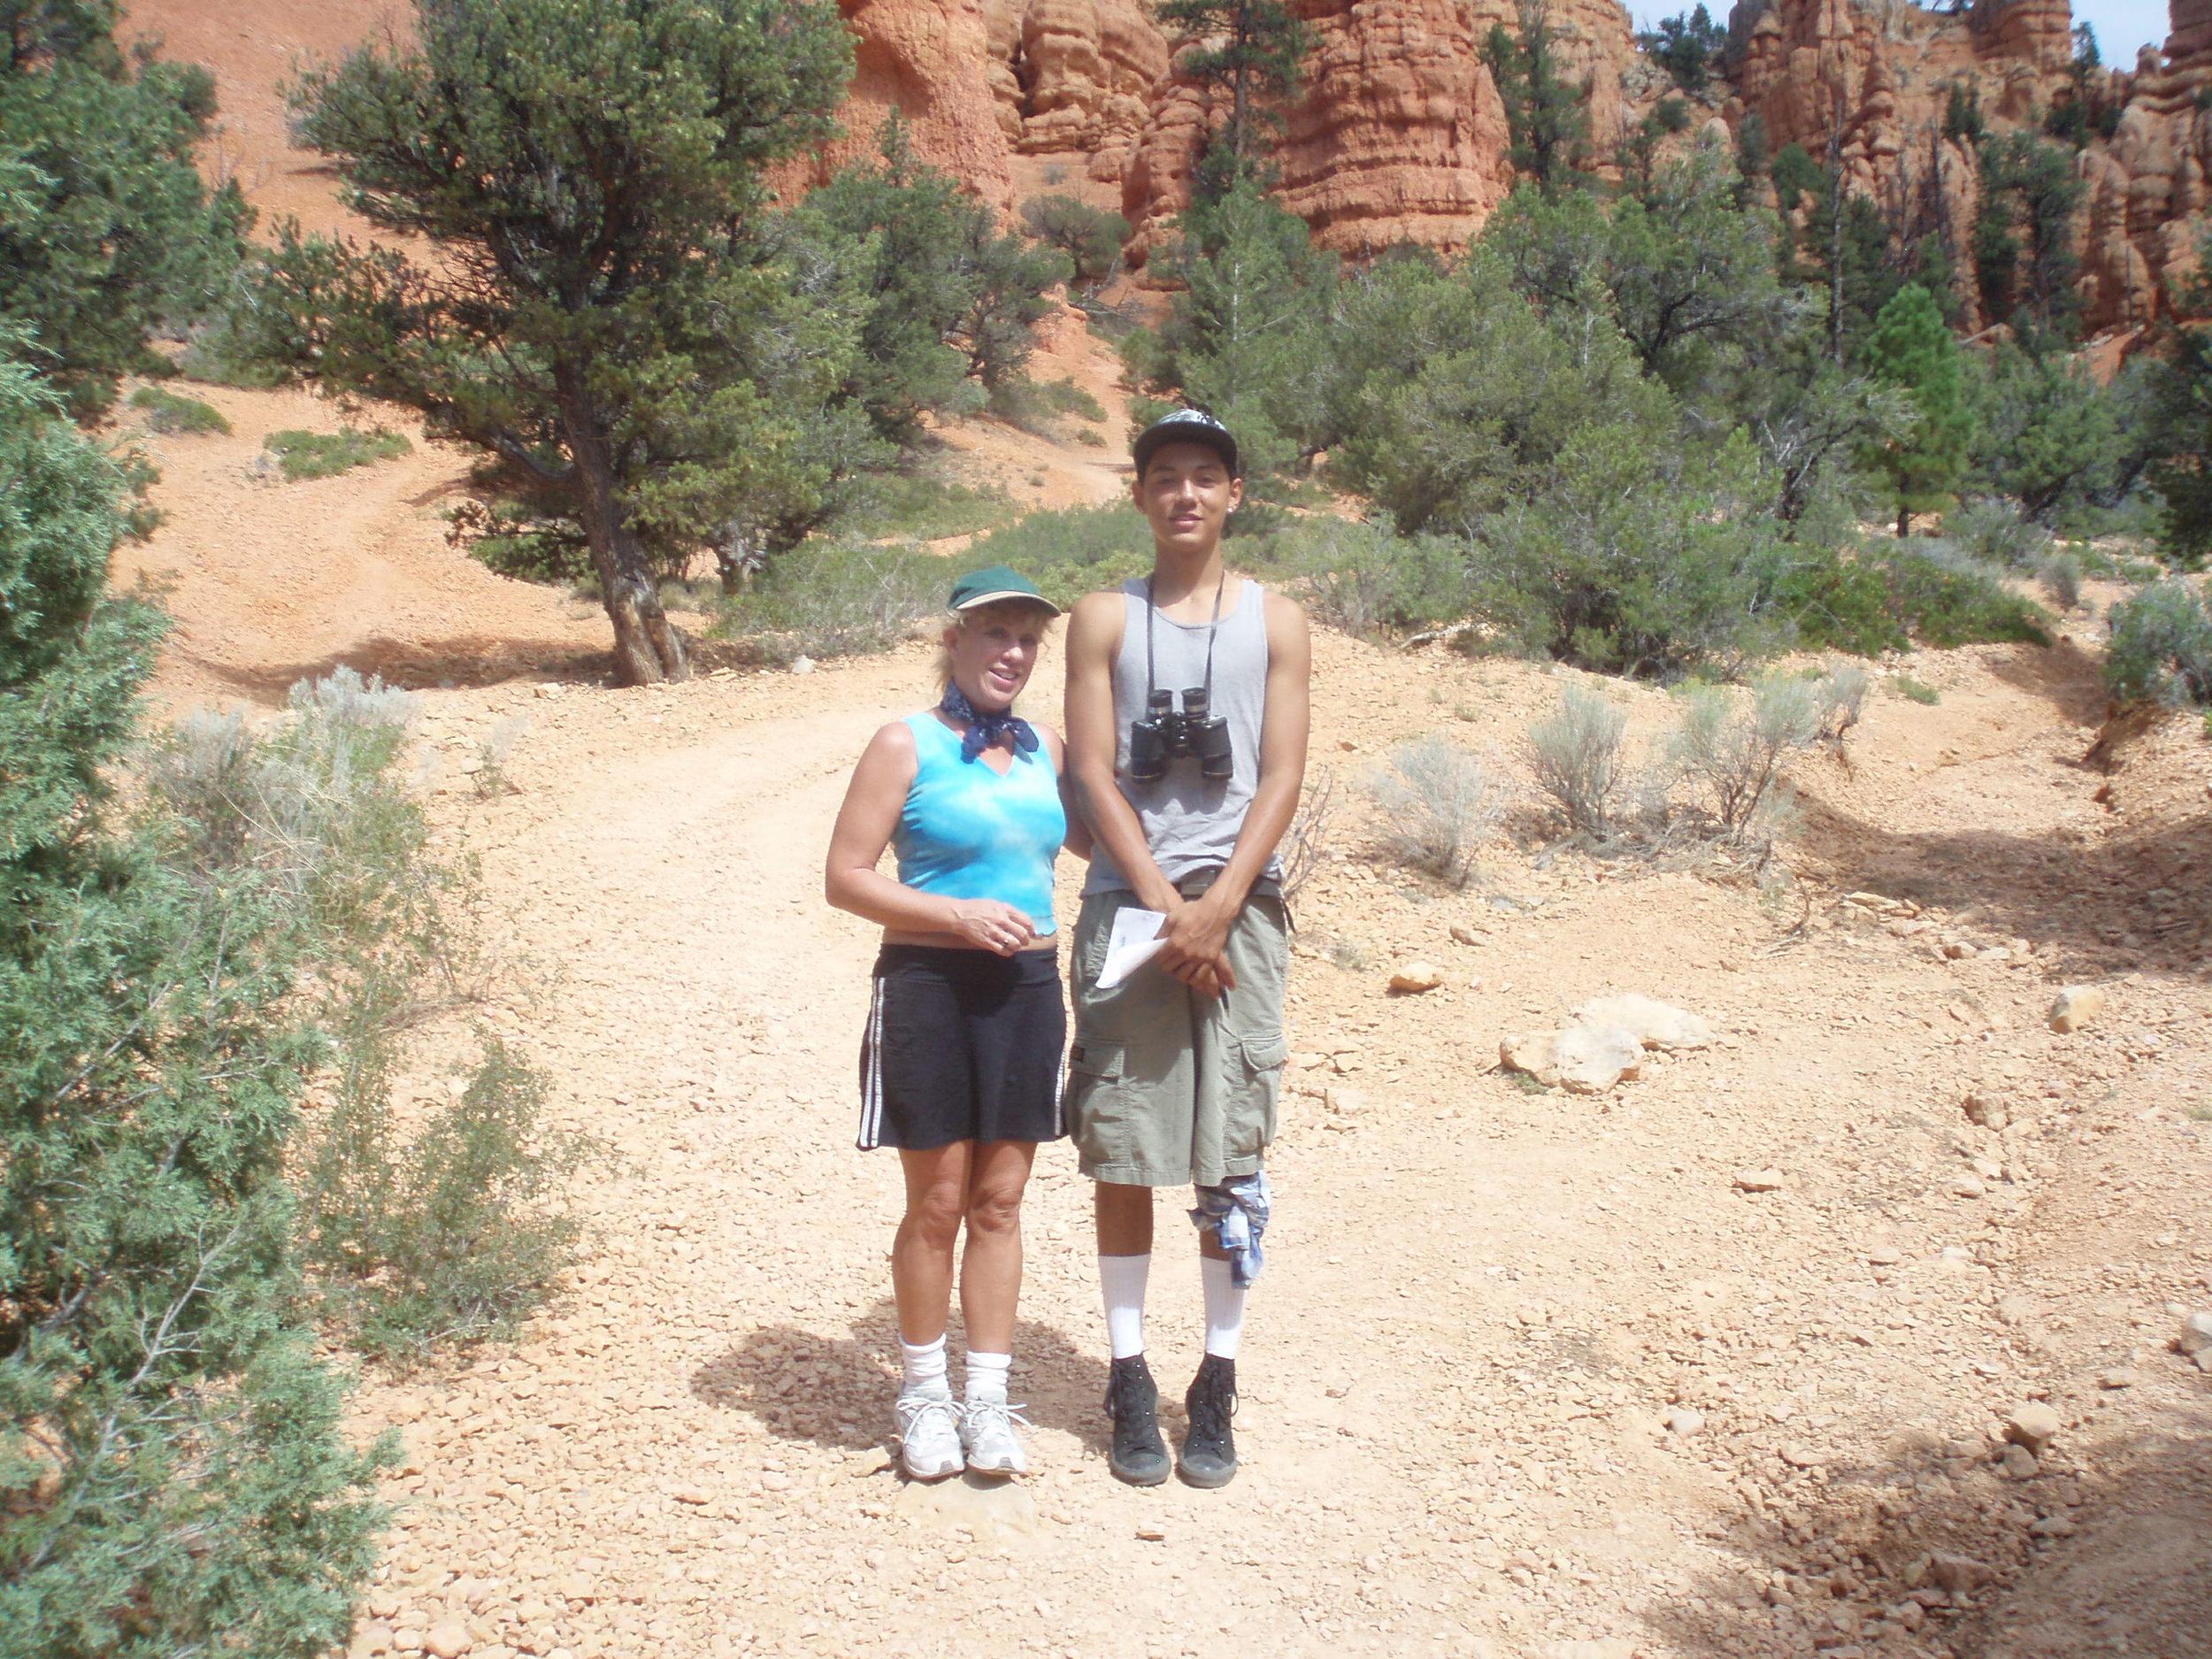 Hiking with Jesus Sanchez in Utah